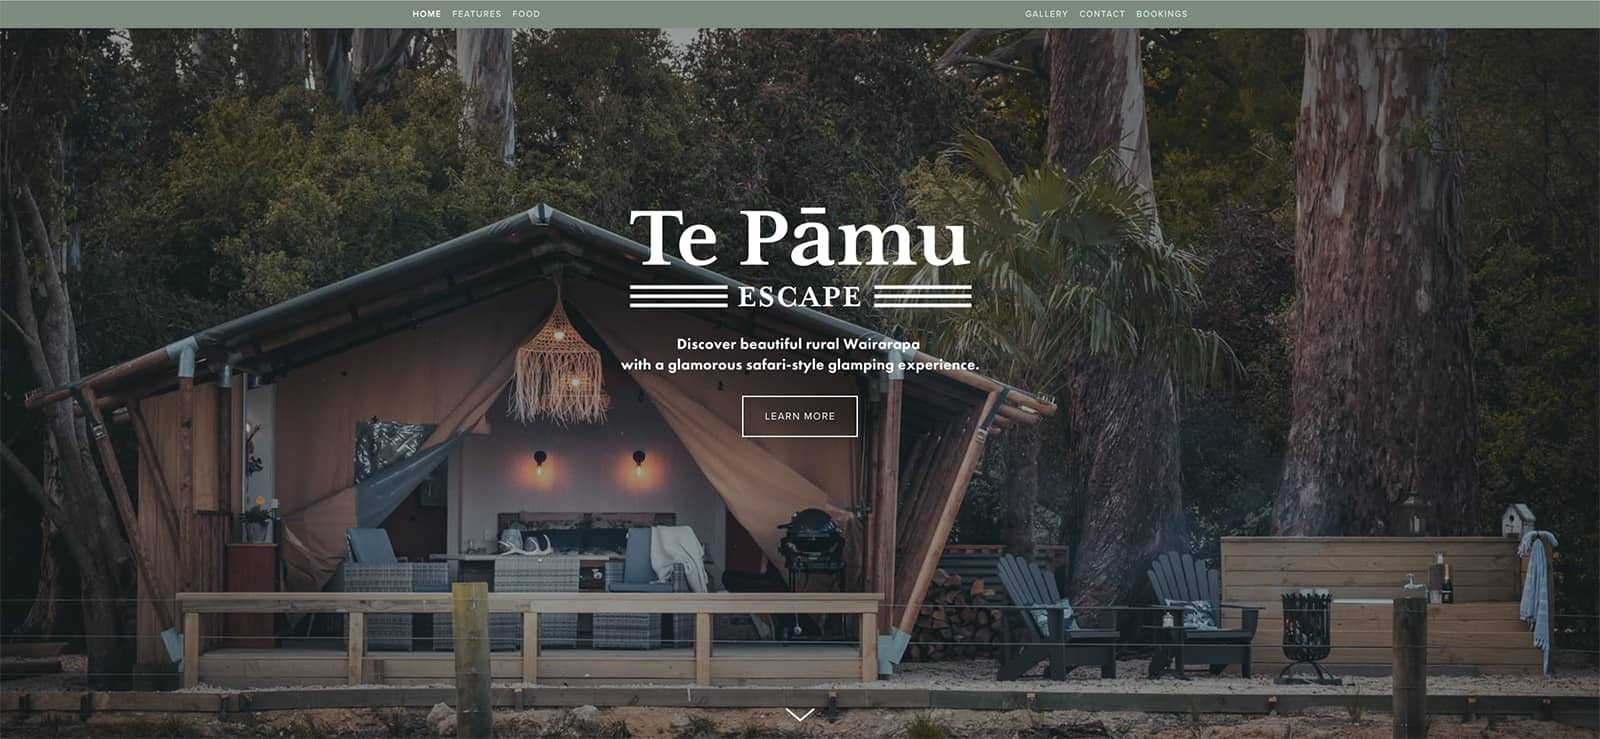 TePamu 1Homeage 1600